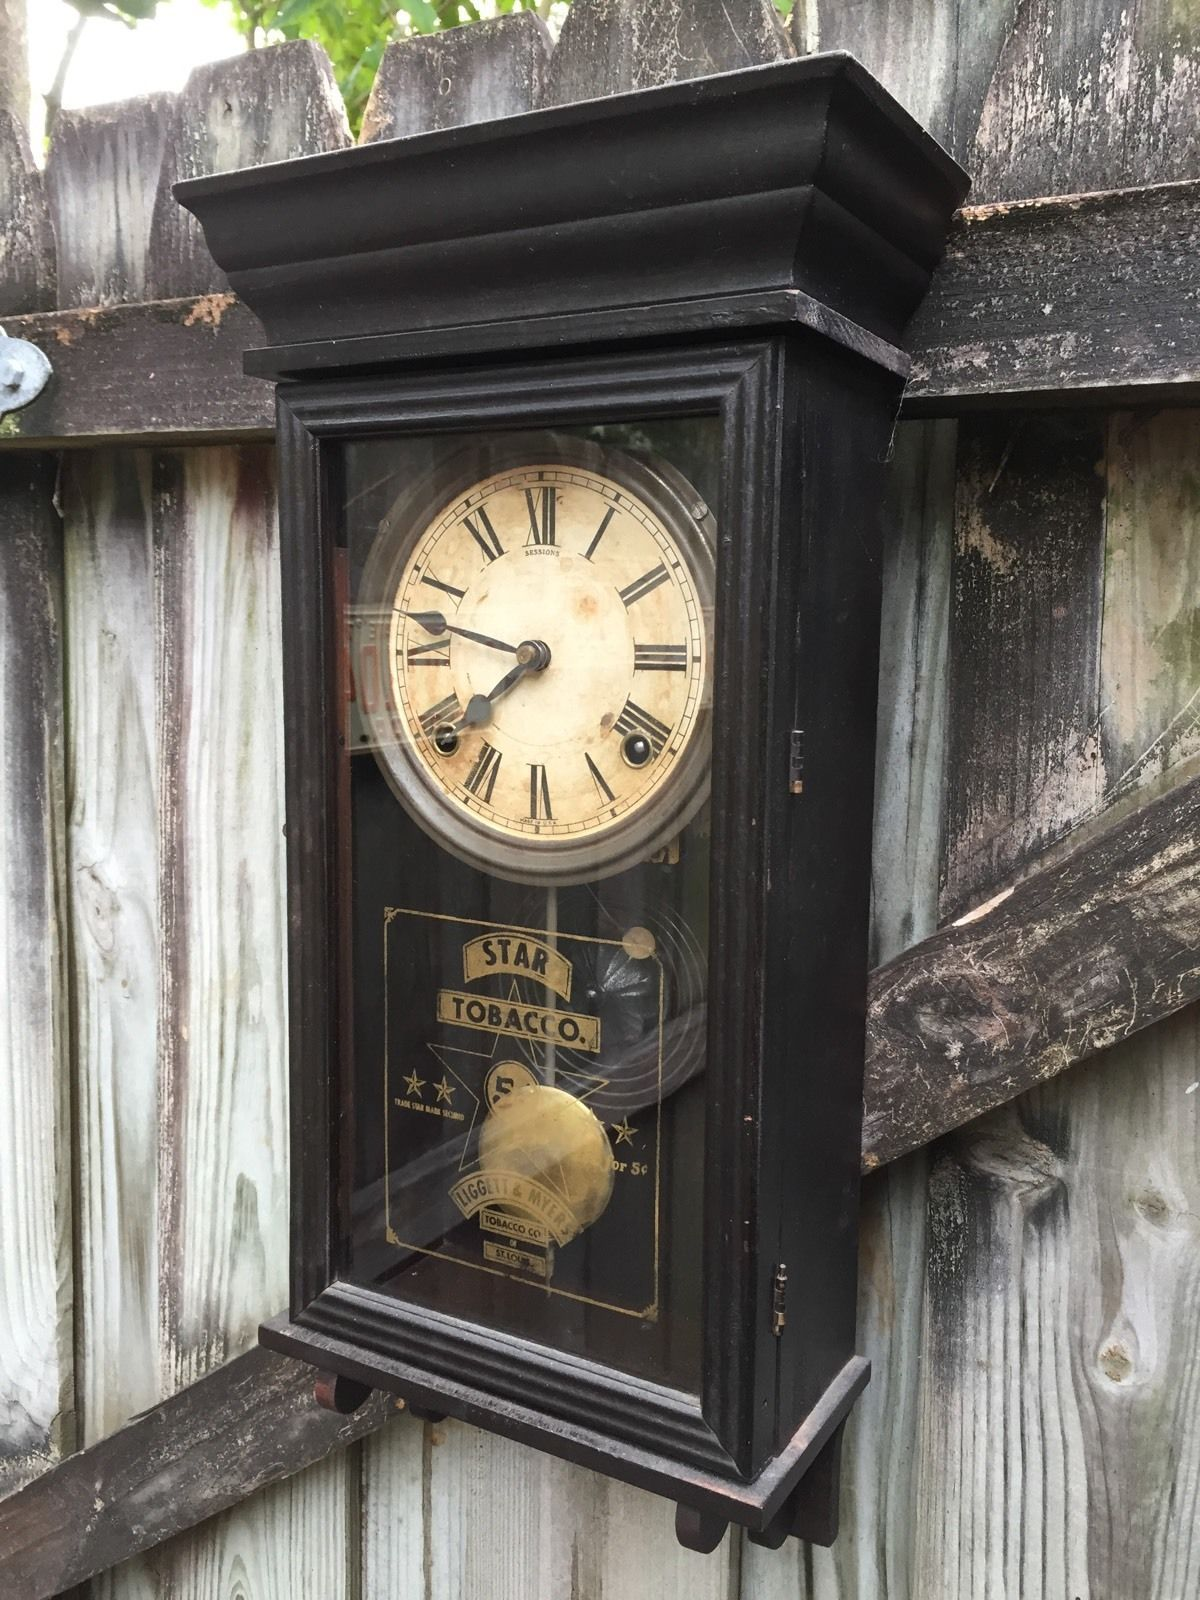 Star Tobacco Antique Miniature Regulator Wall Clock By Sessions Wall Clock Clock Antiques